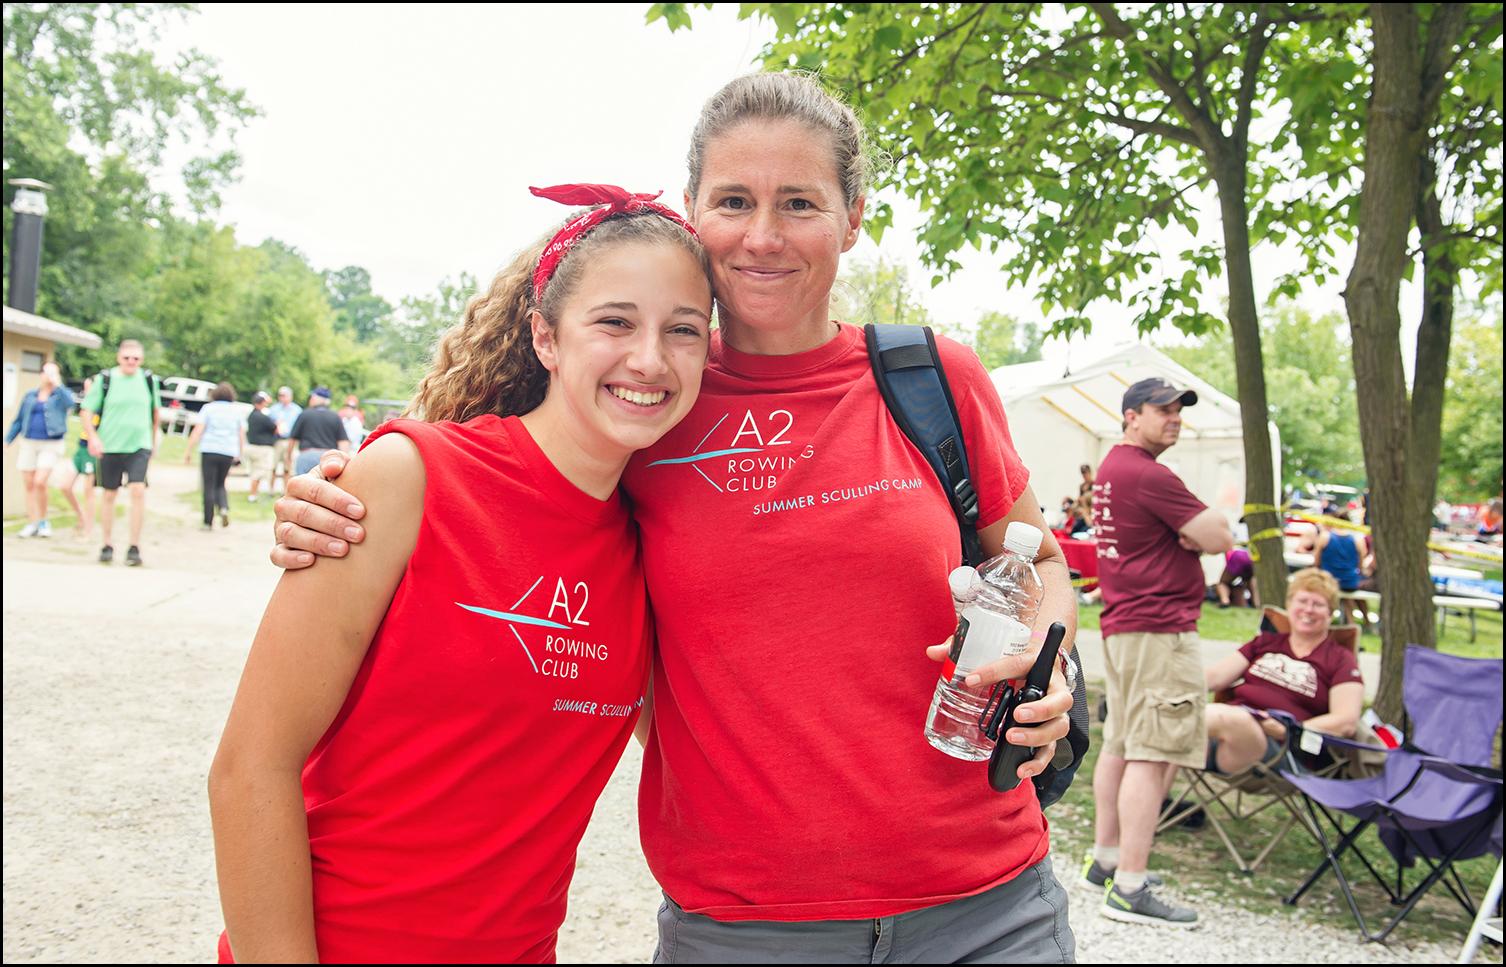 Youth Programs Ann Arbor Rowing Club